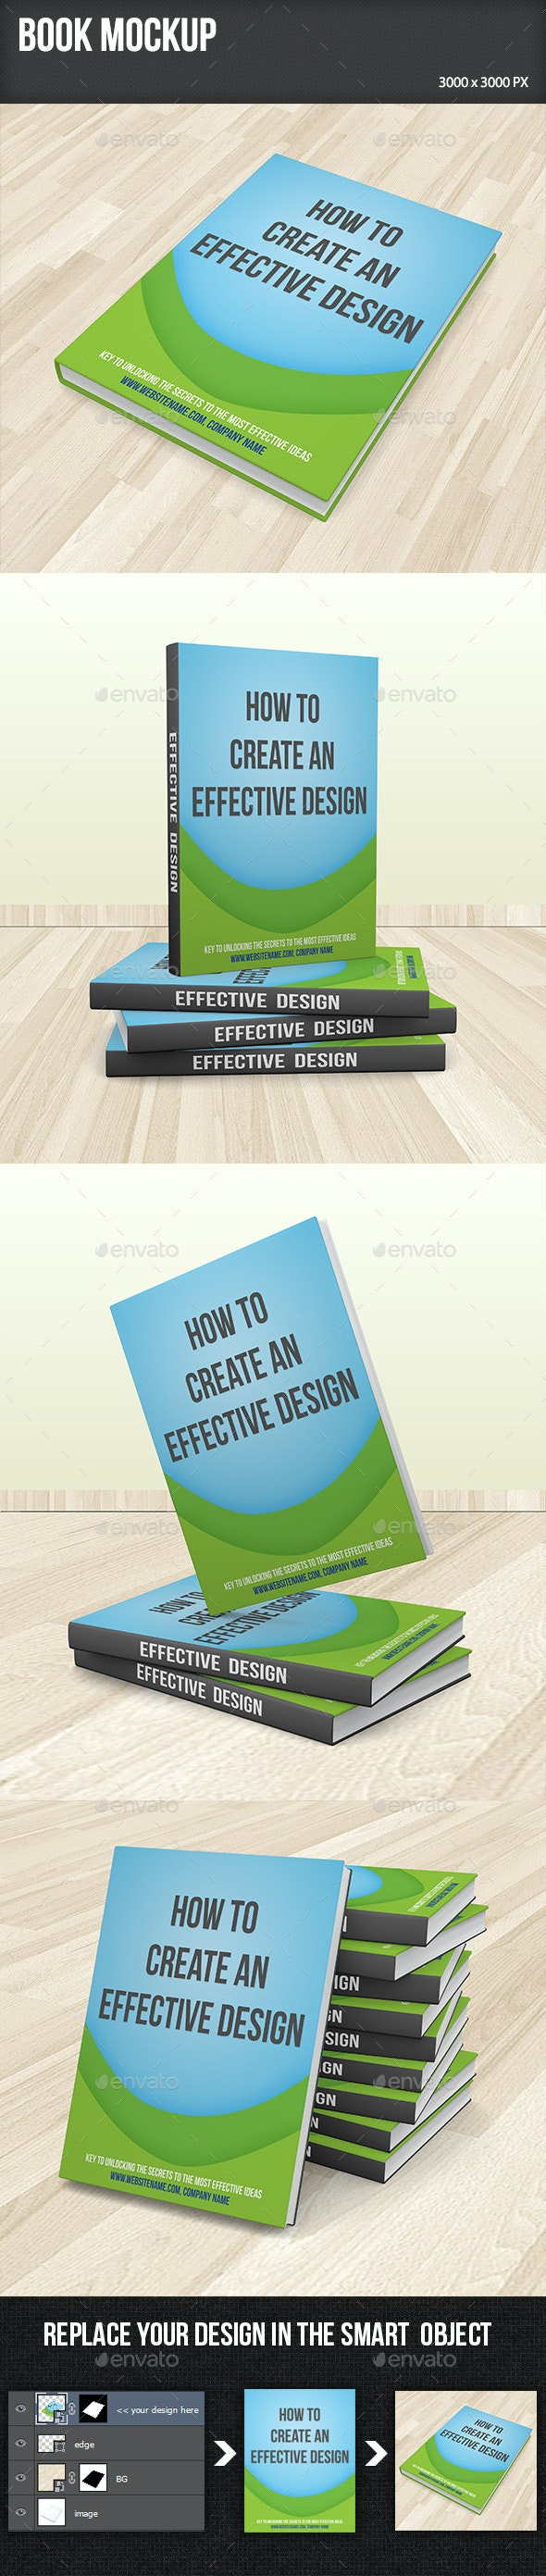 Book Mockup - Product Mock-Ups Graphics